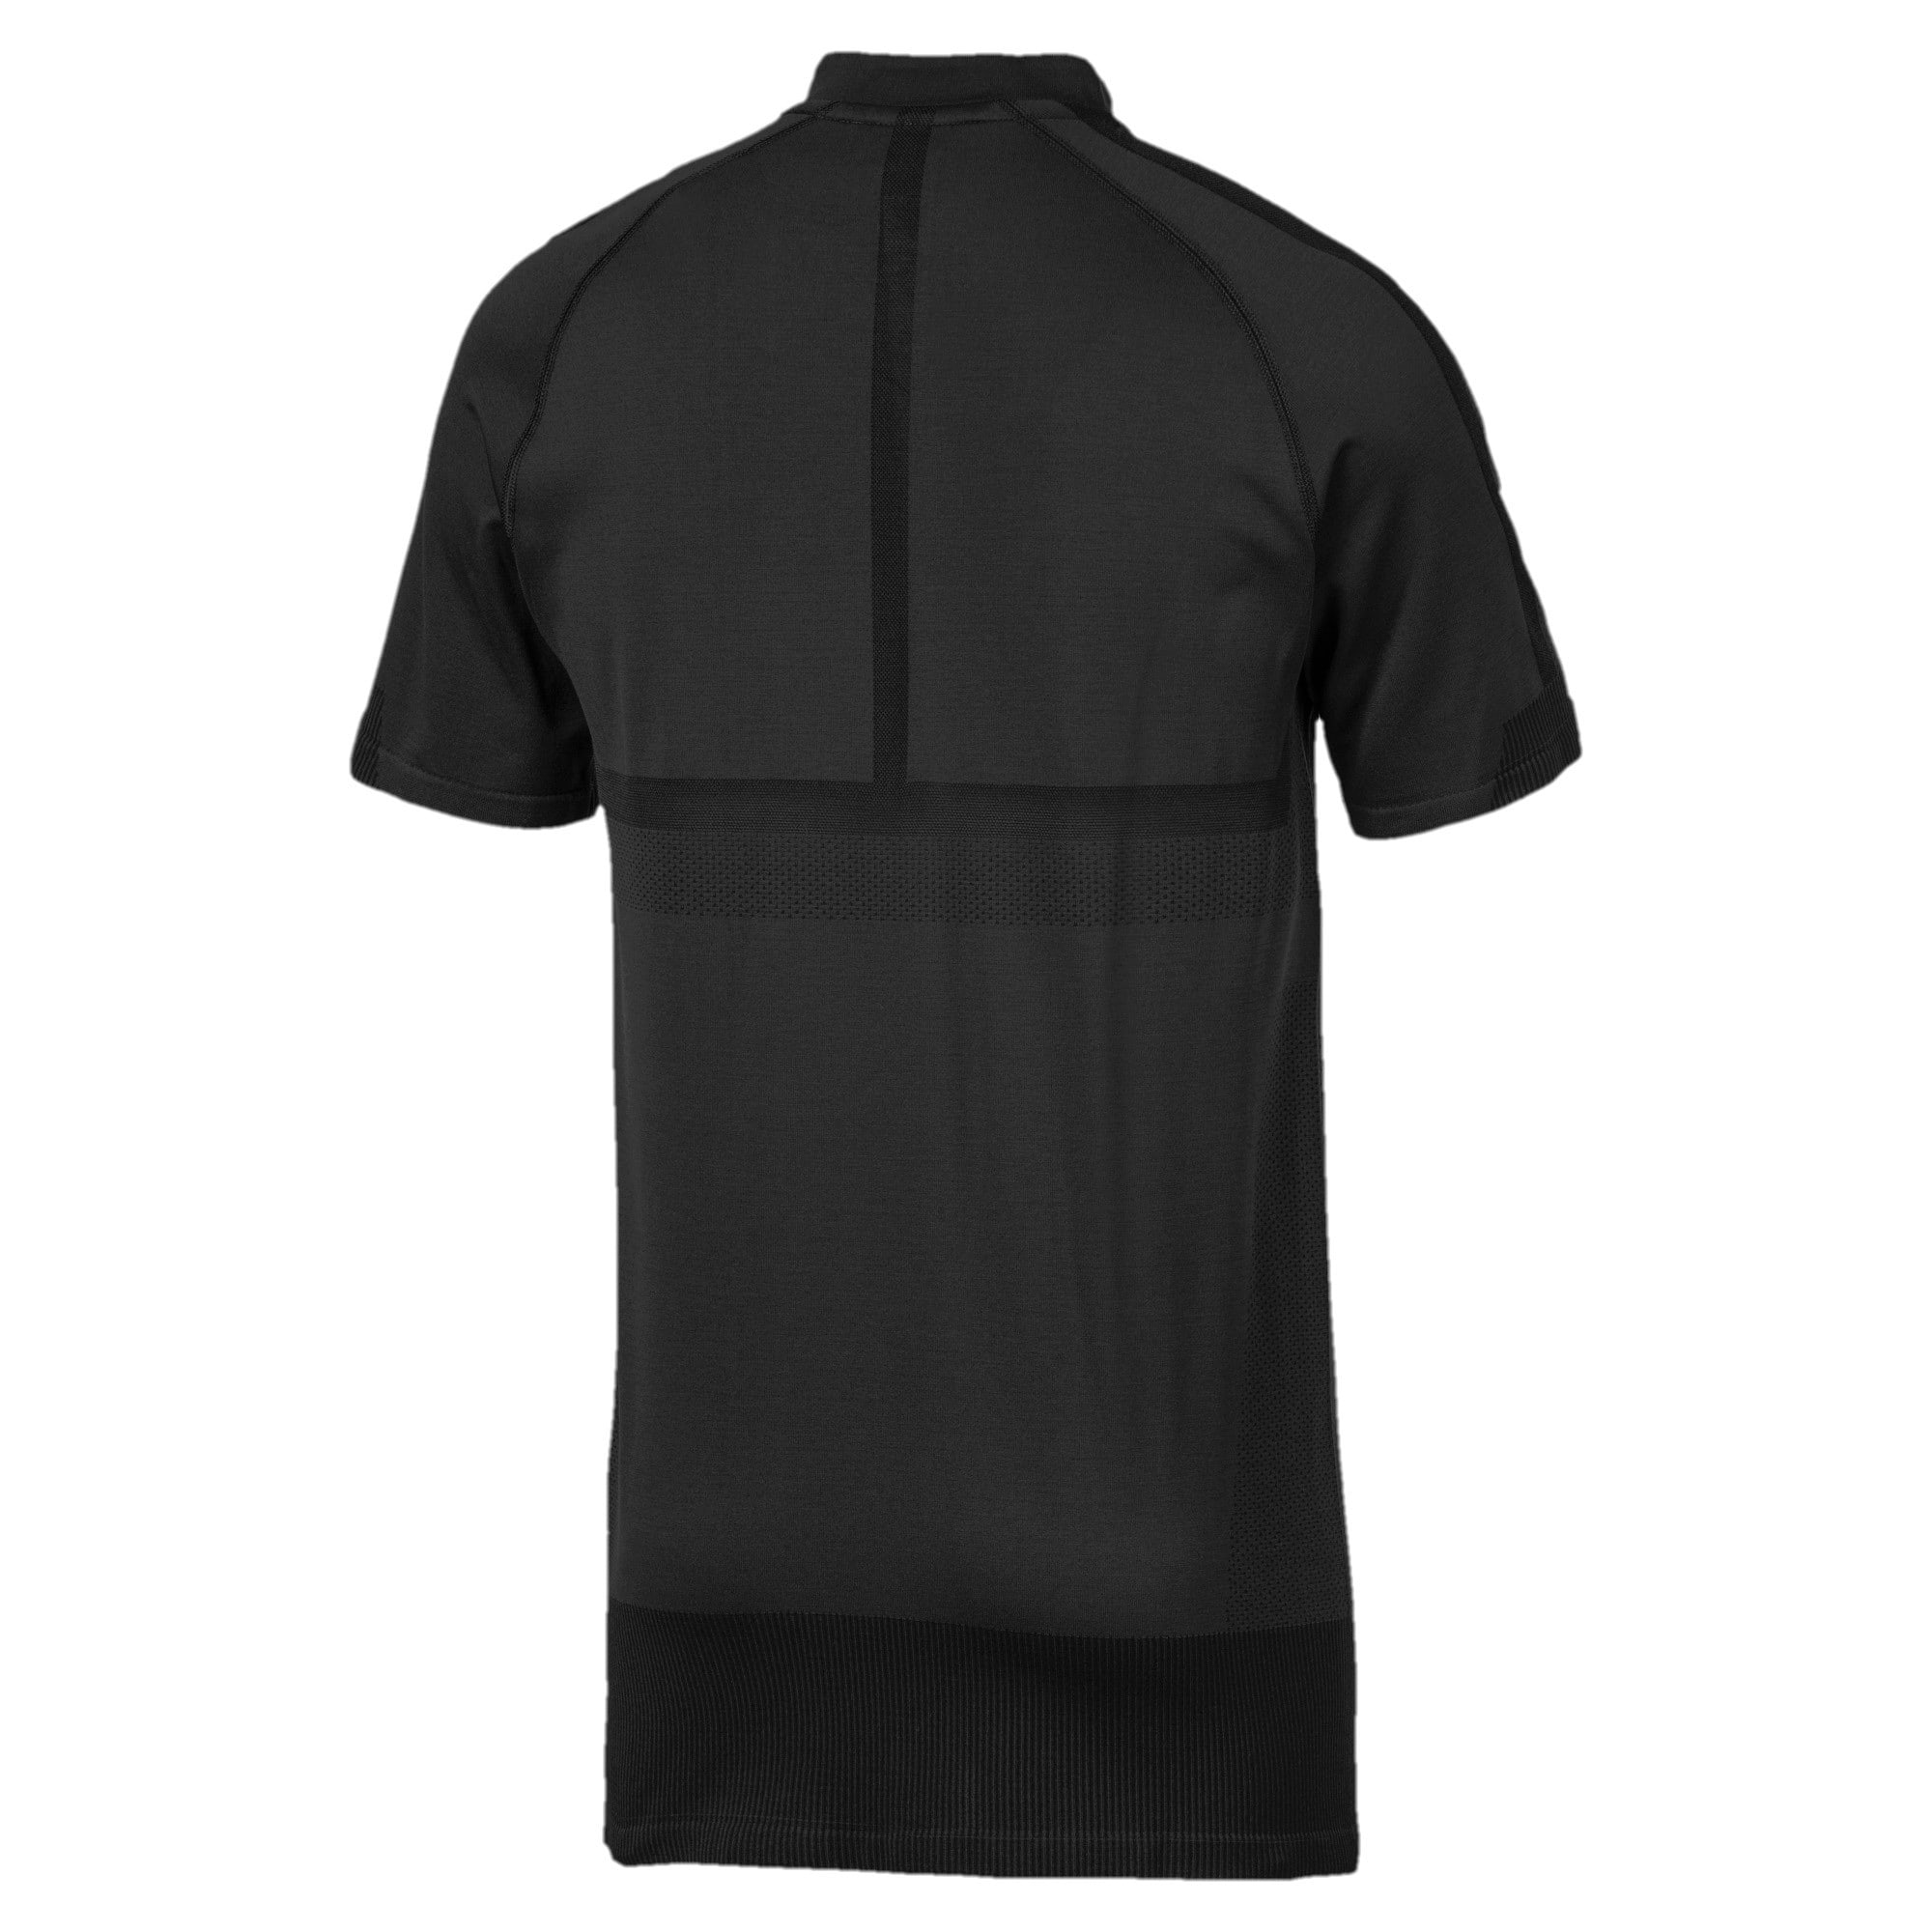 Thumbnail 6 of Mercedes AMG Petronas Men's Polo Shirt, Puma Black, medium